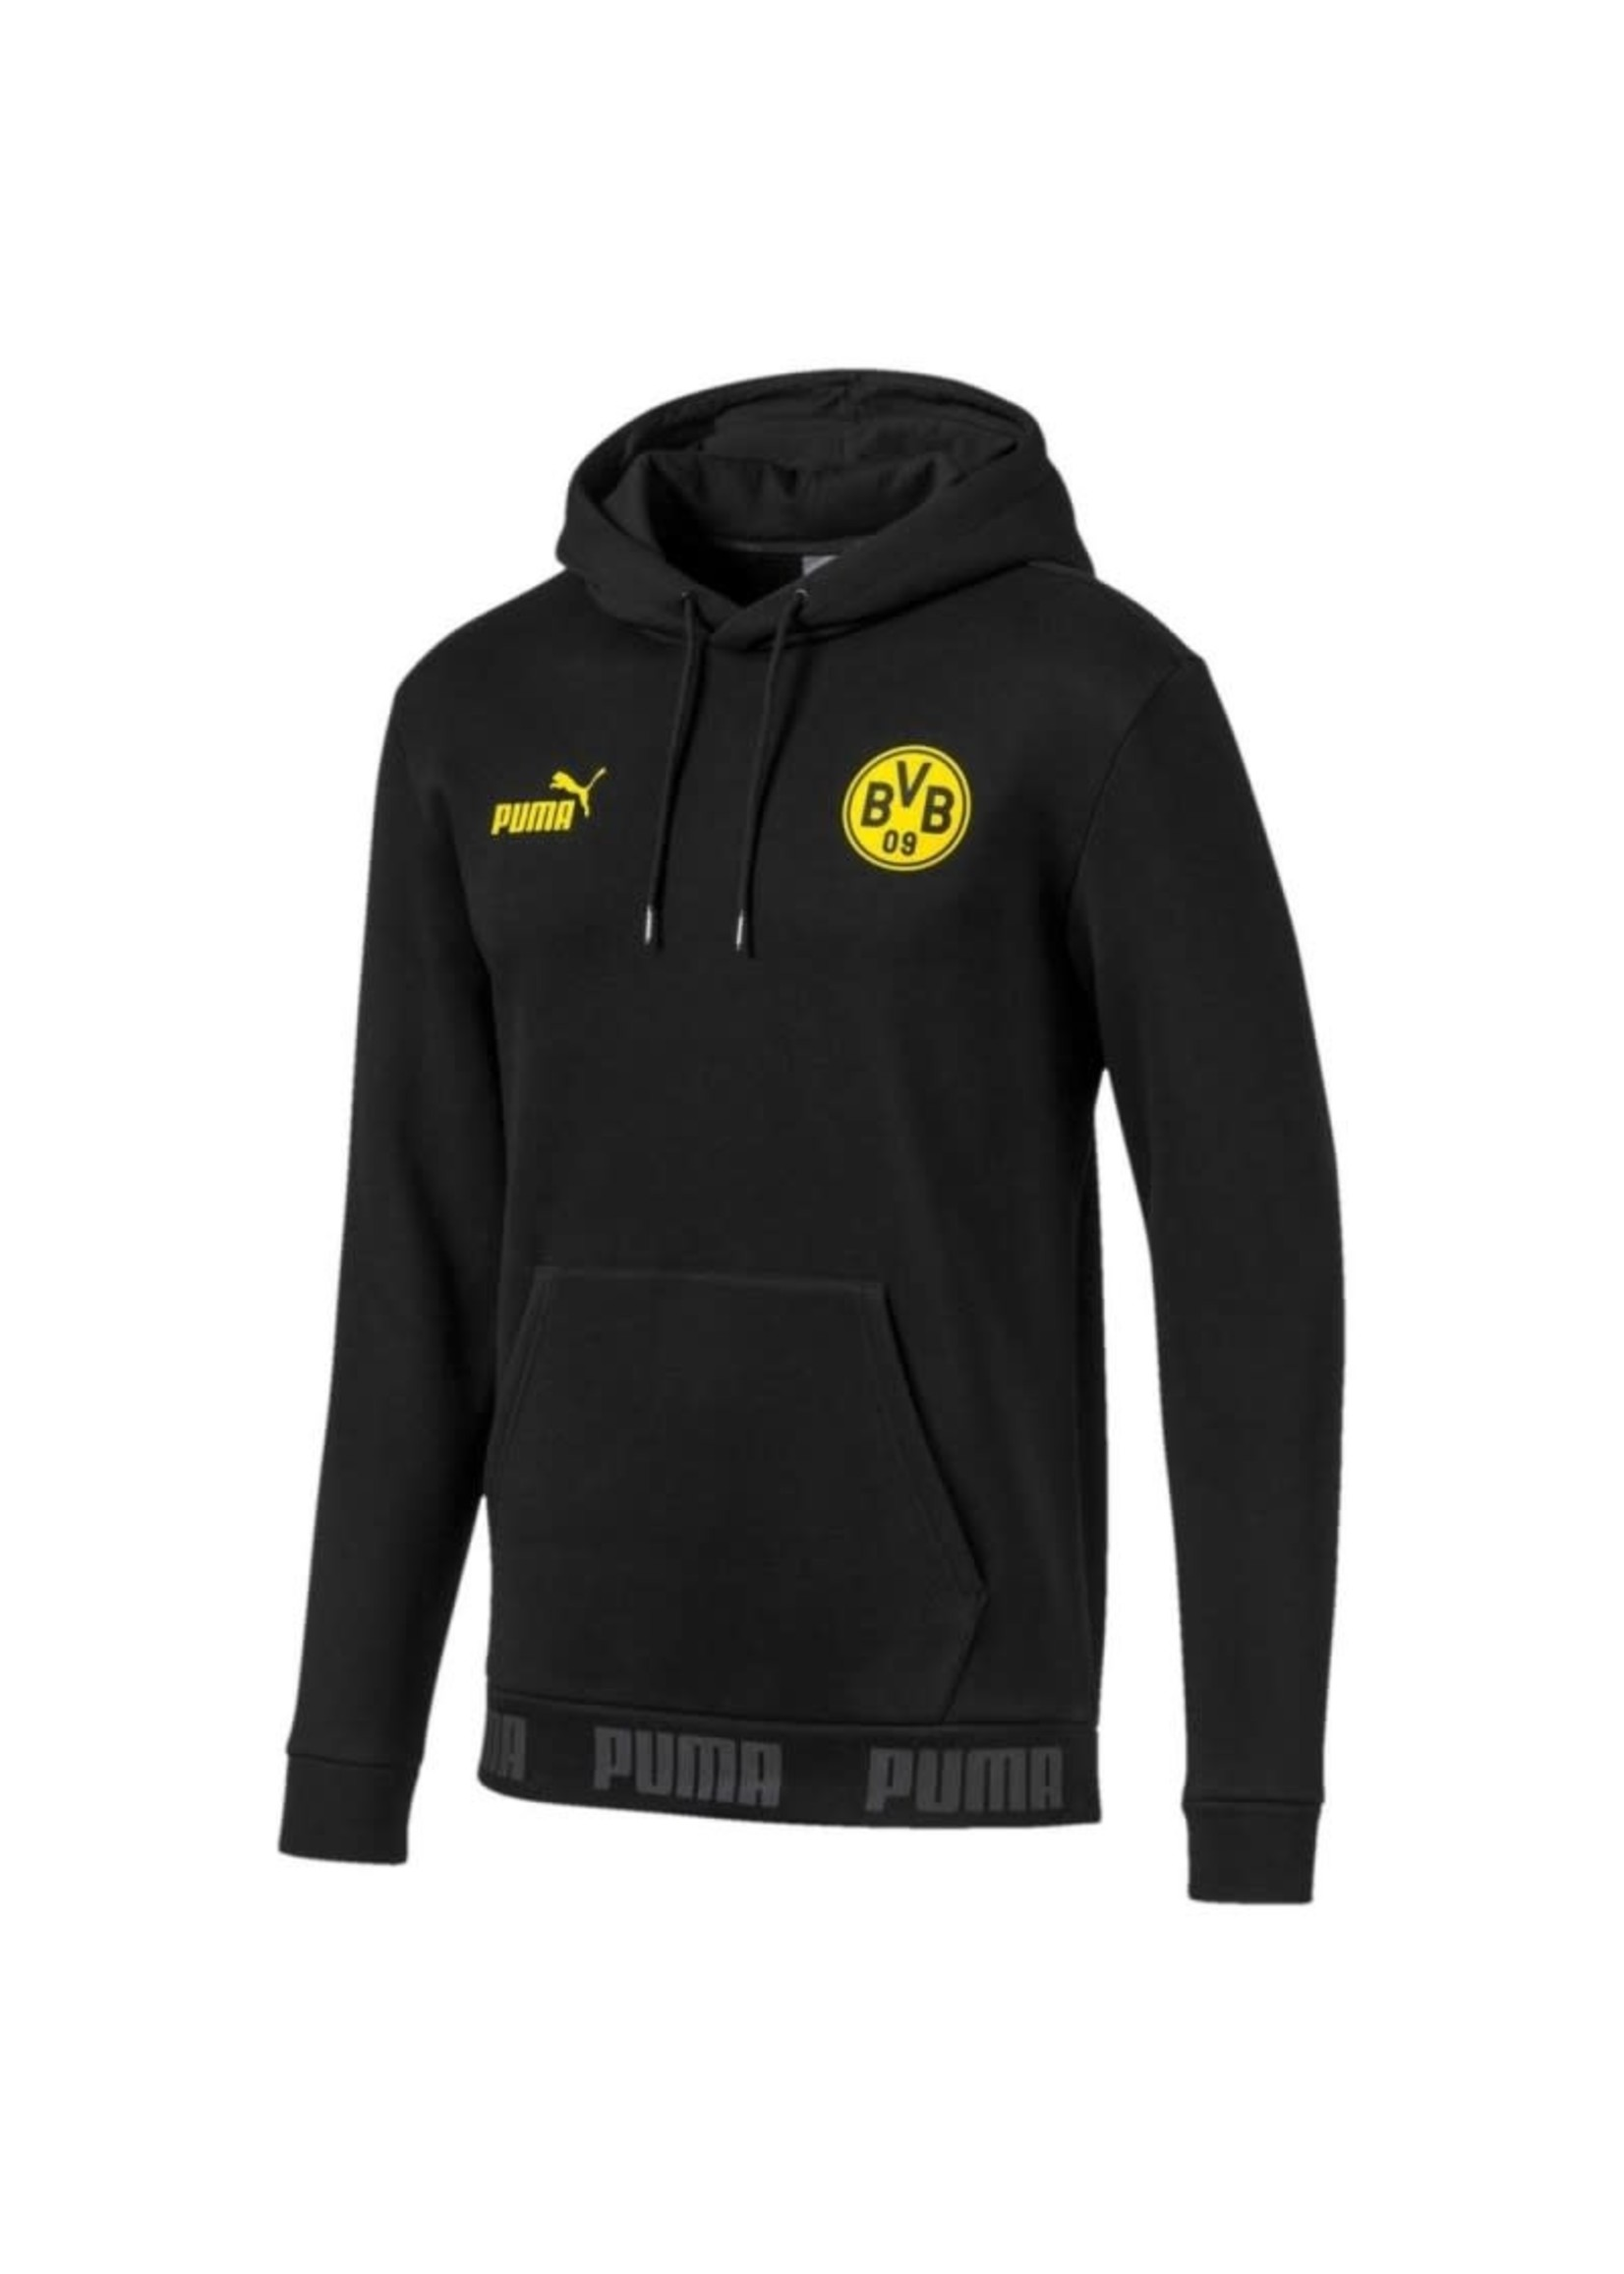 Puma Borussia Dortmund Hoodie - 19/20 Away